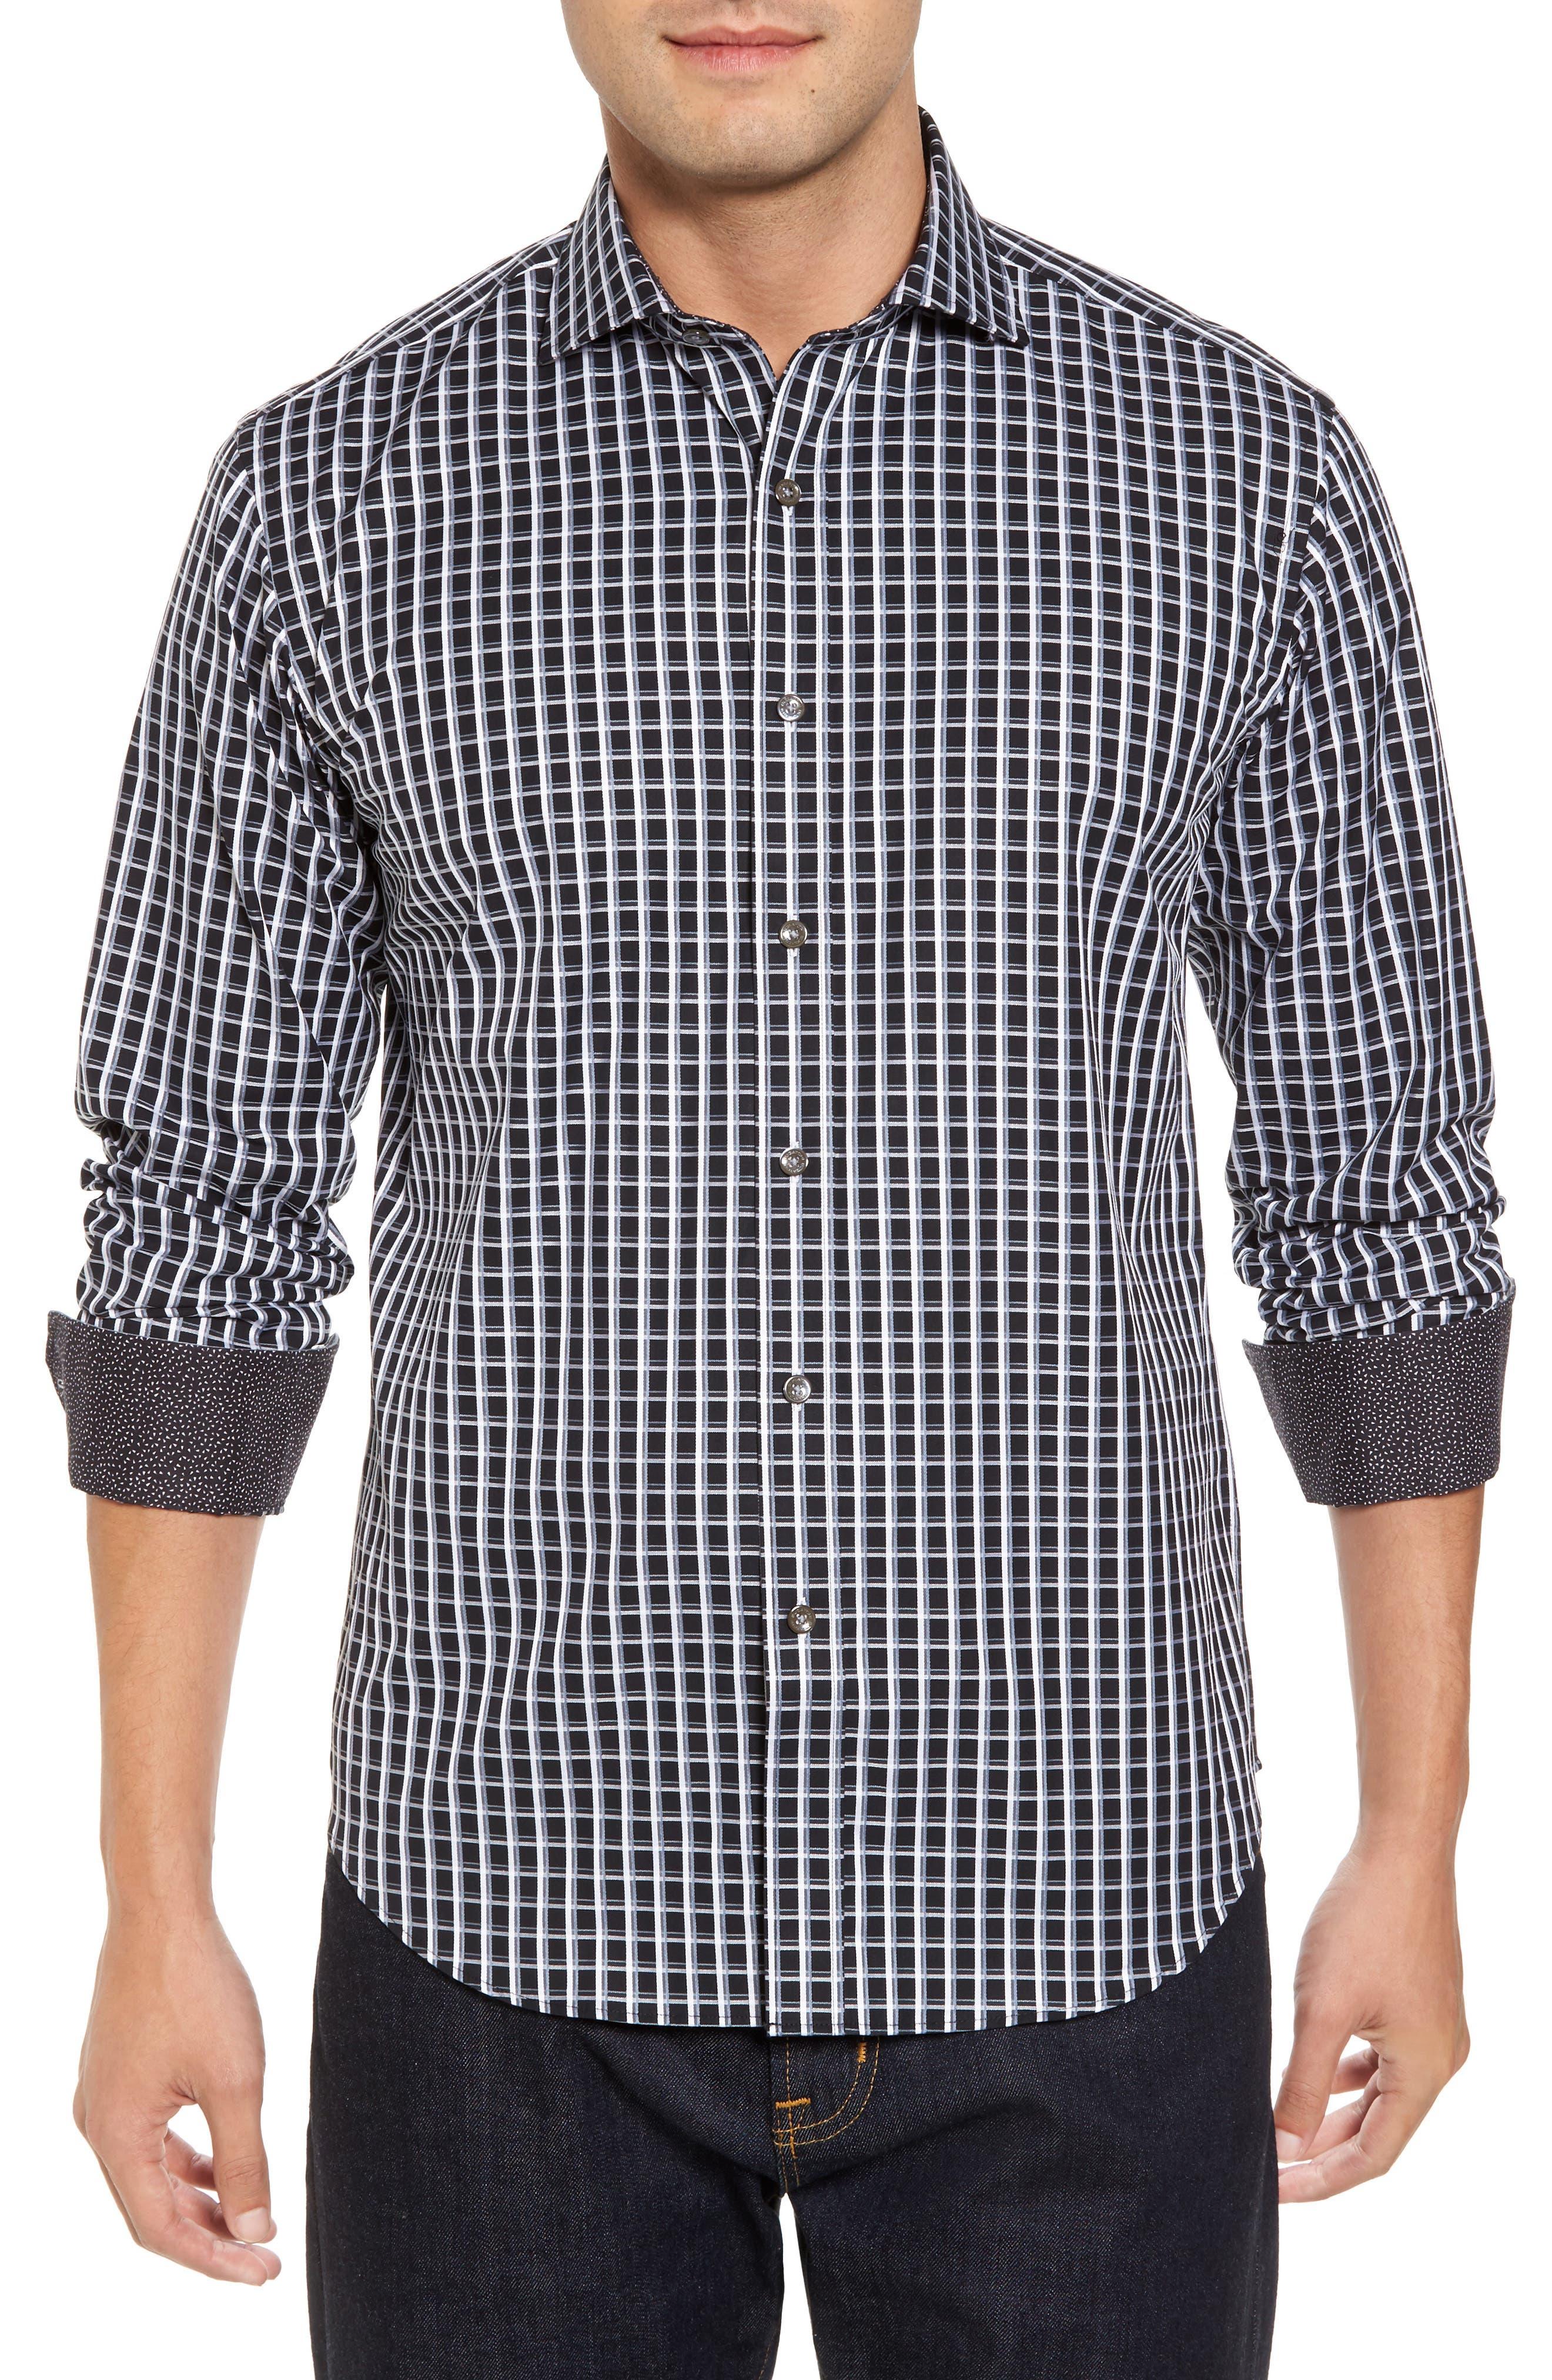 Alternate Image 1 Selected - Bugatchi Shaped Fit Print Sport Shirt